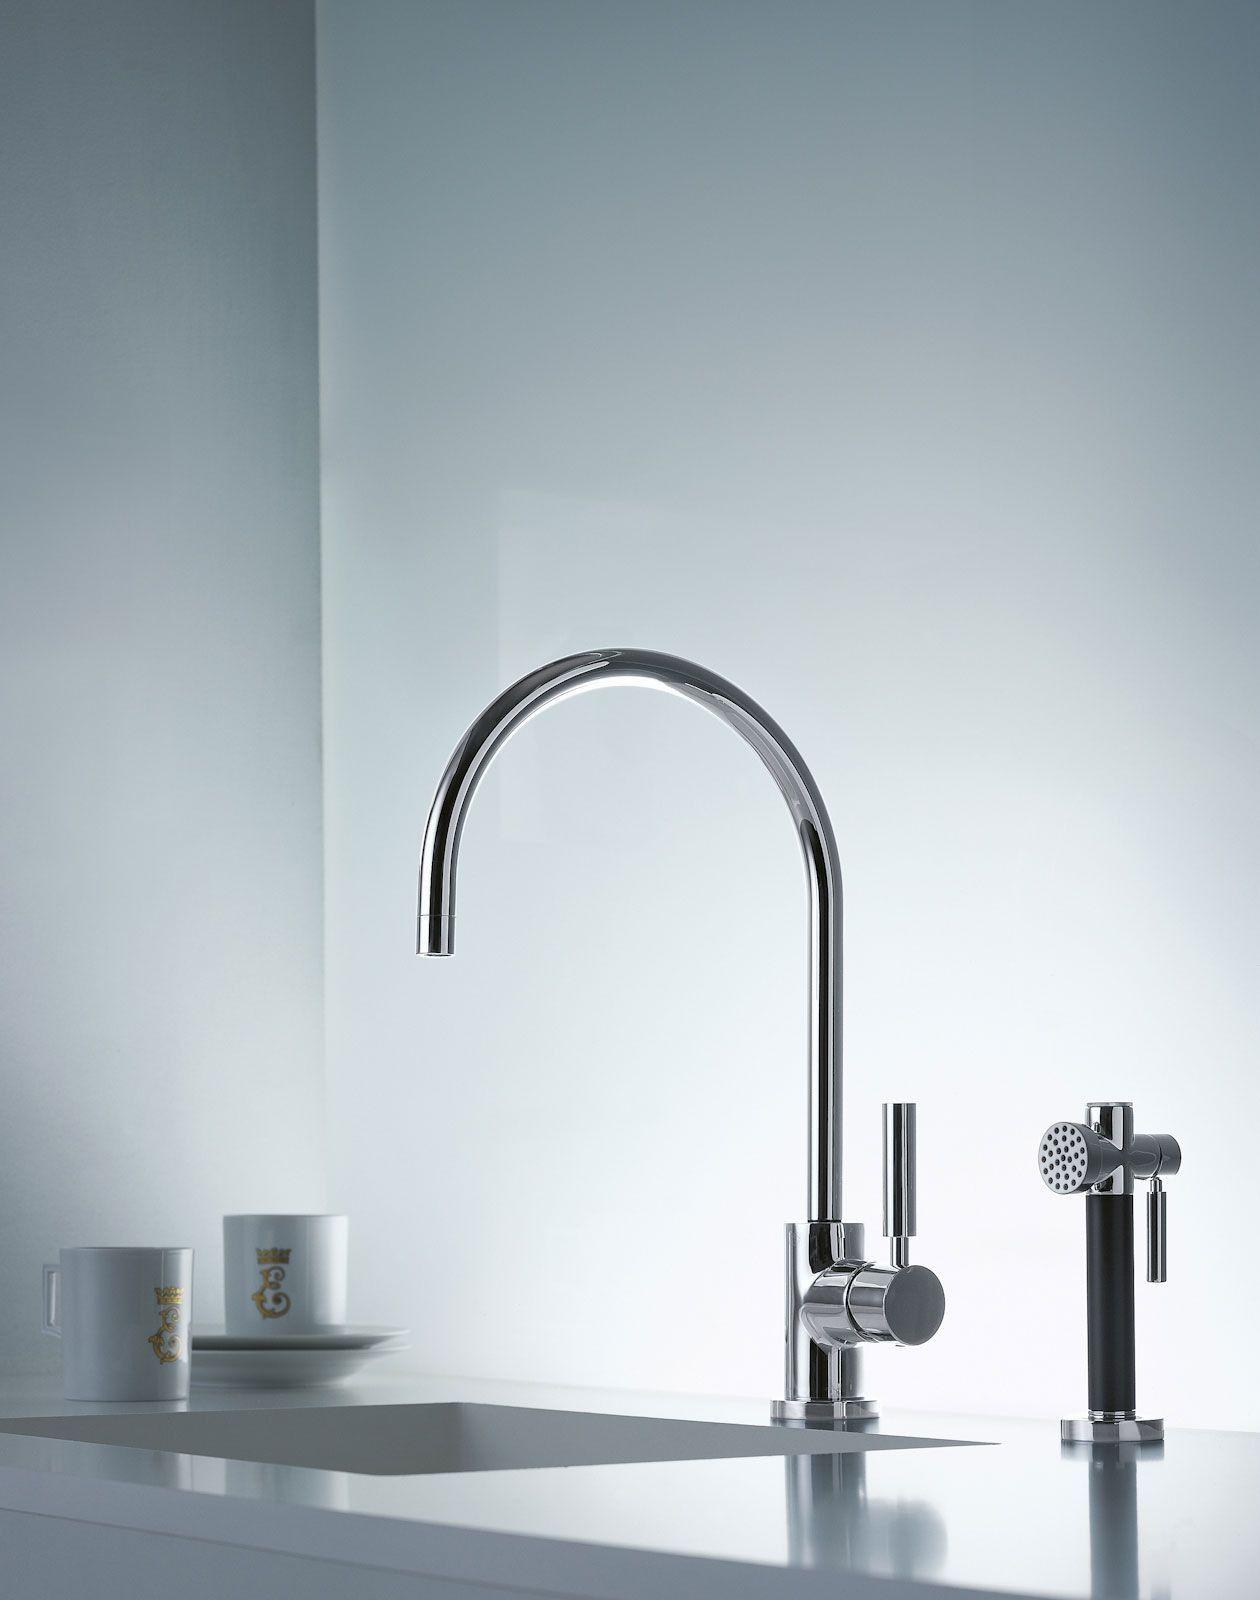 Beautiful Dornbracht Bathroom Faucet   Faucet, Plumbing fixtures and Cl